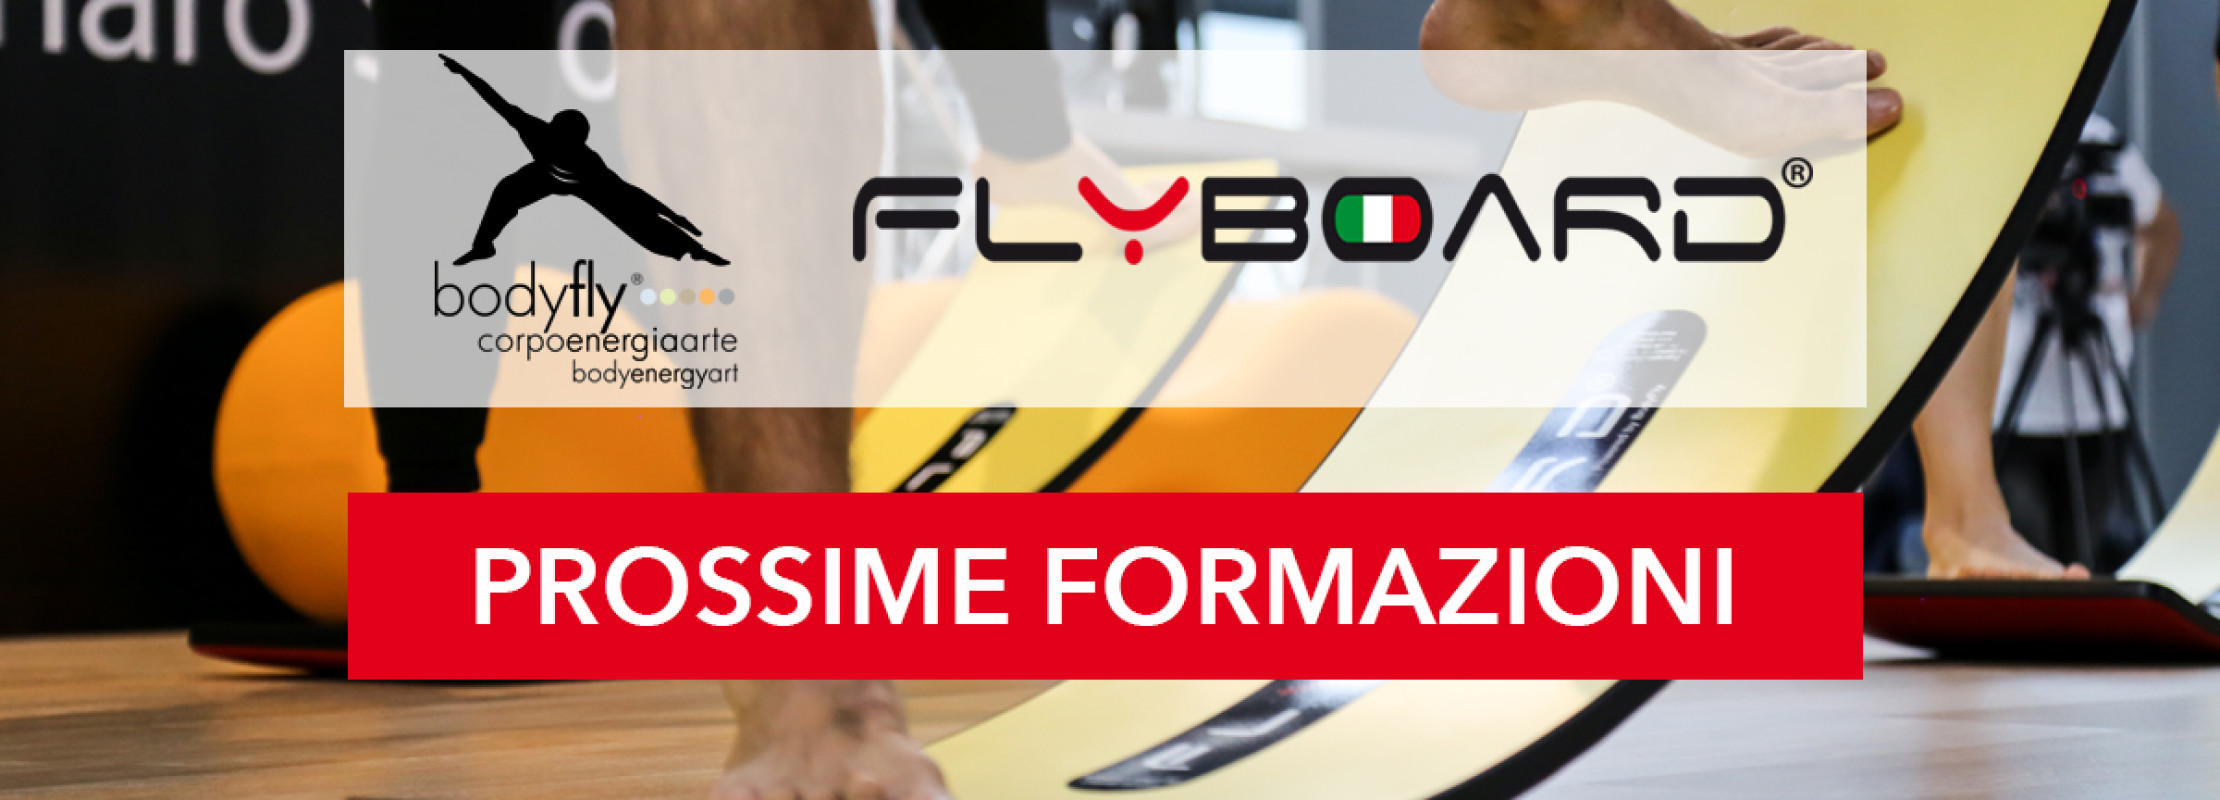 BodyFly e Flyboard prossime formazioni fitness